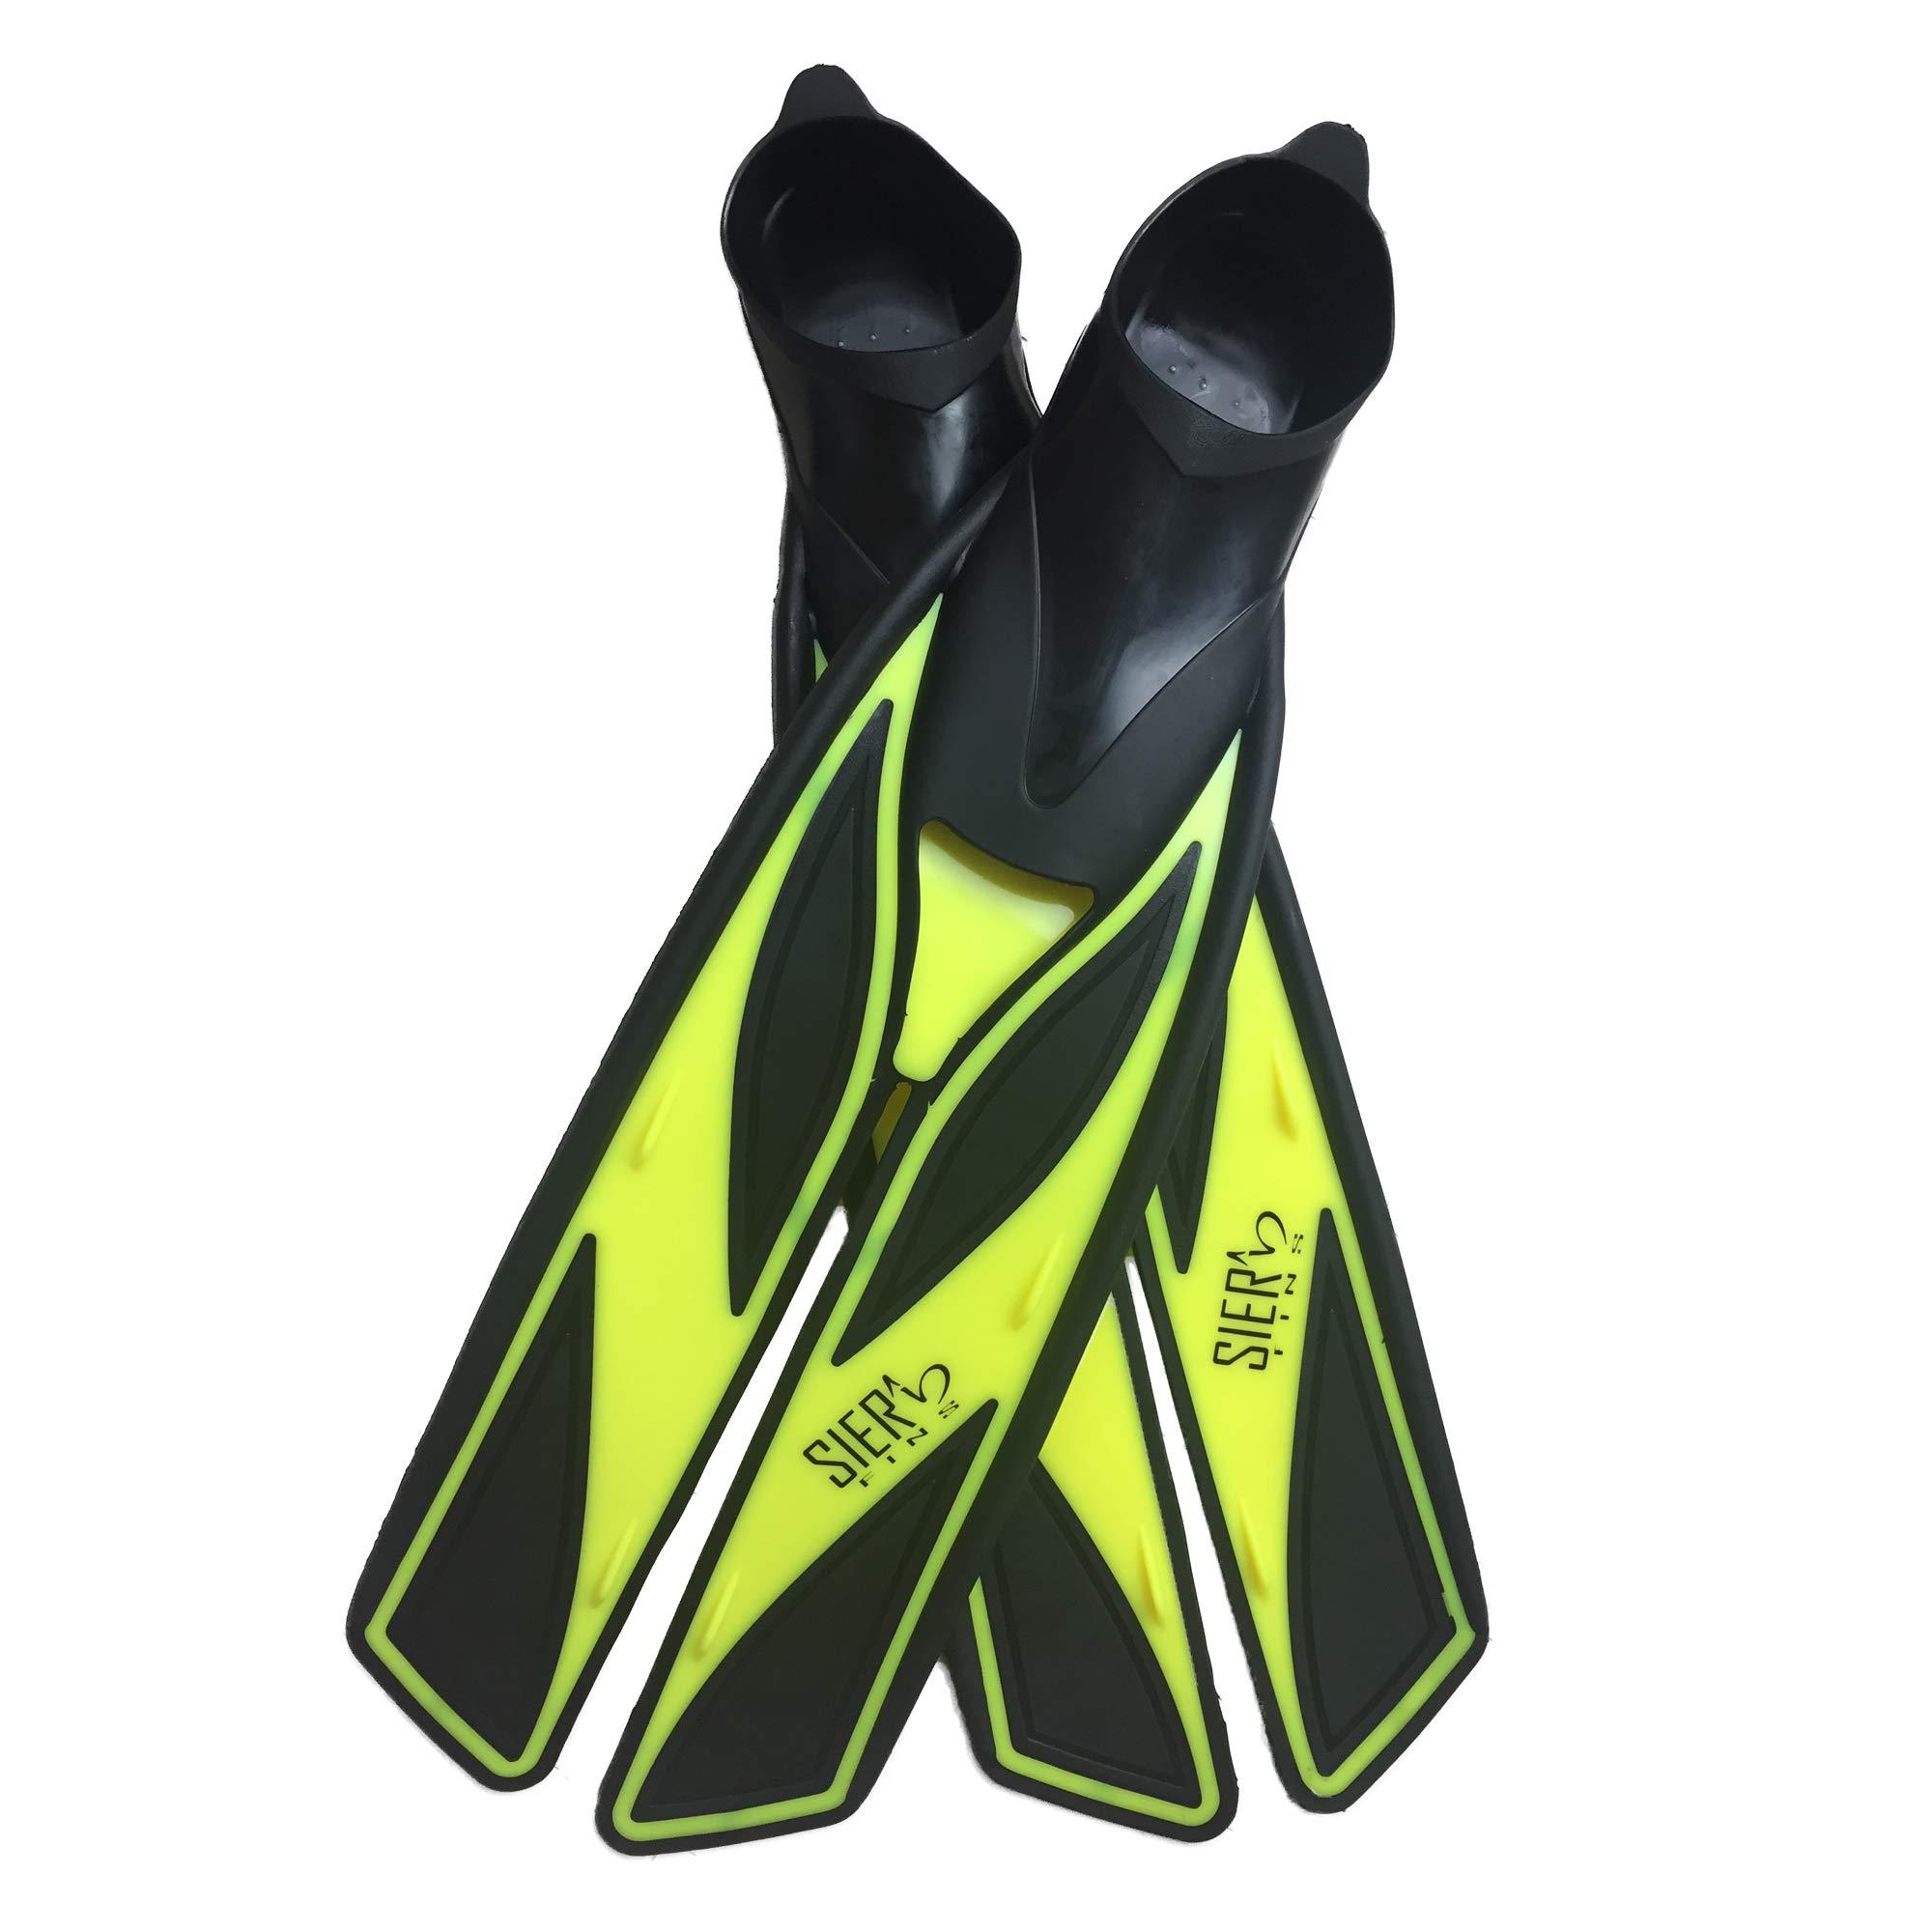 Split Snorkel Fins, Full Foot Diving Fins and Scuba Flippers Fins, Includes Mesh Bag (Yellow, XL EUR 45-46 US Men 10.5-11.5 Women 11.5-12.5) by Sier Fins